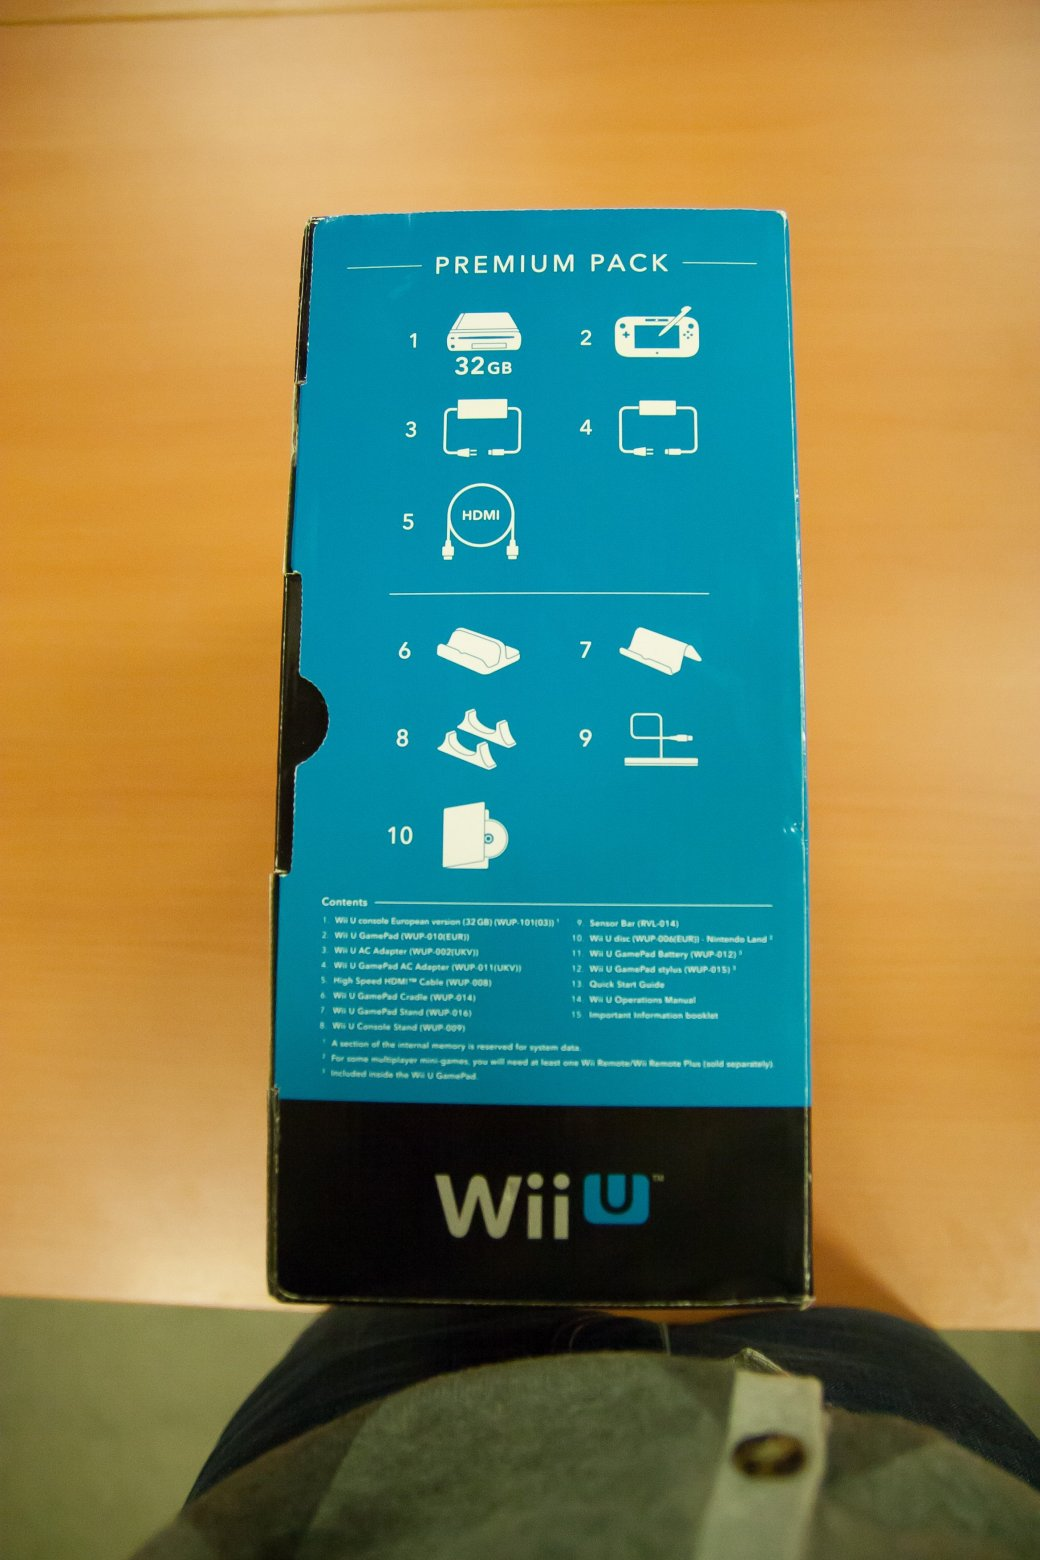 Неделя Nintendo на Канобу! Анбоксинг консоли Wii U | Канобу - Изображение 3